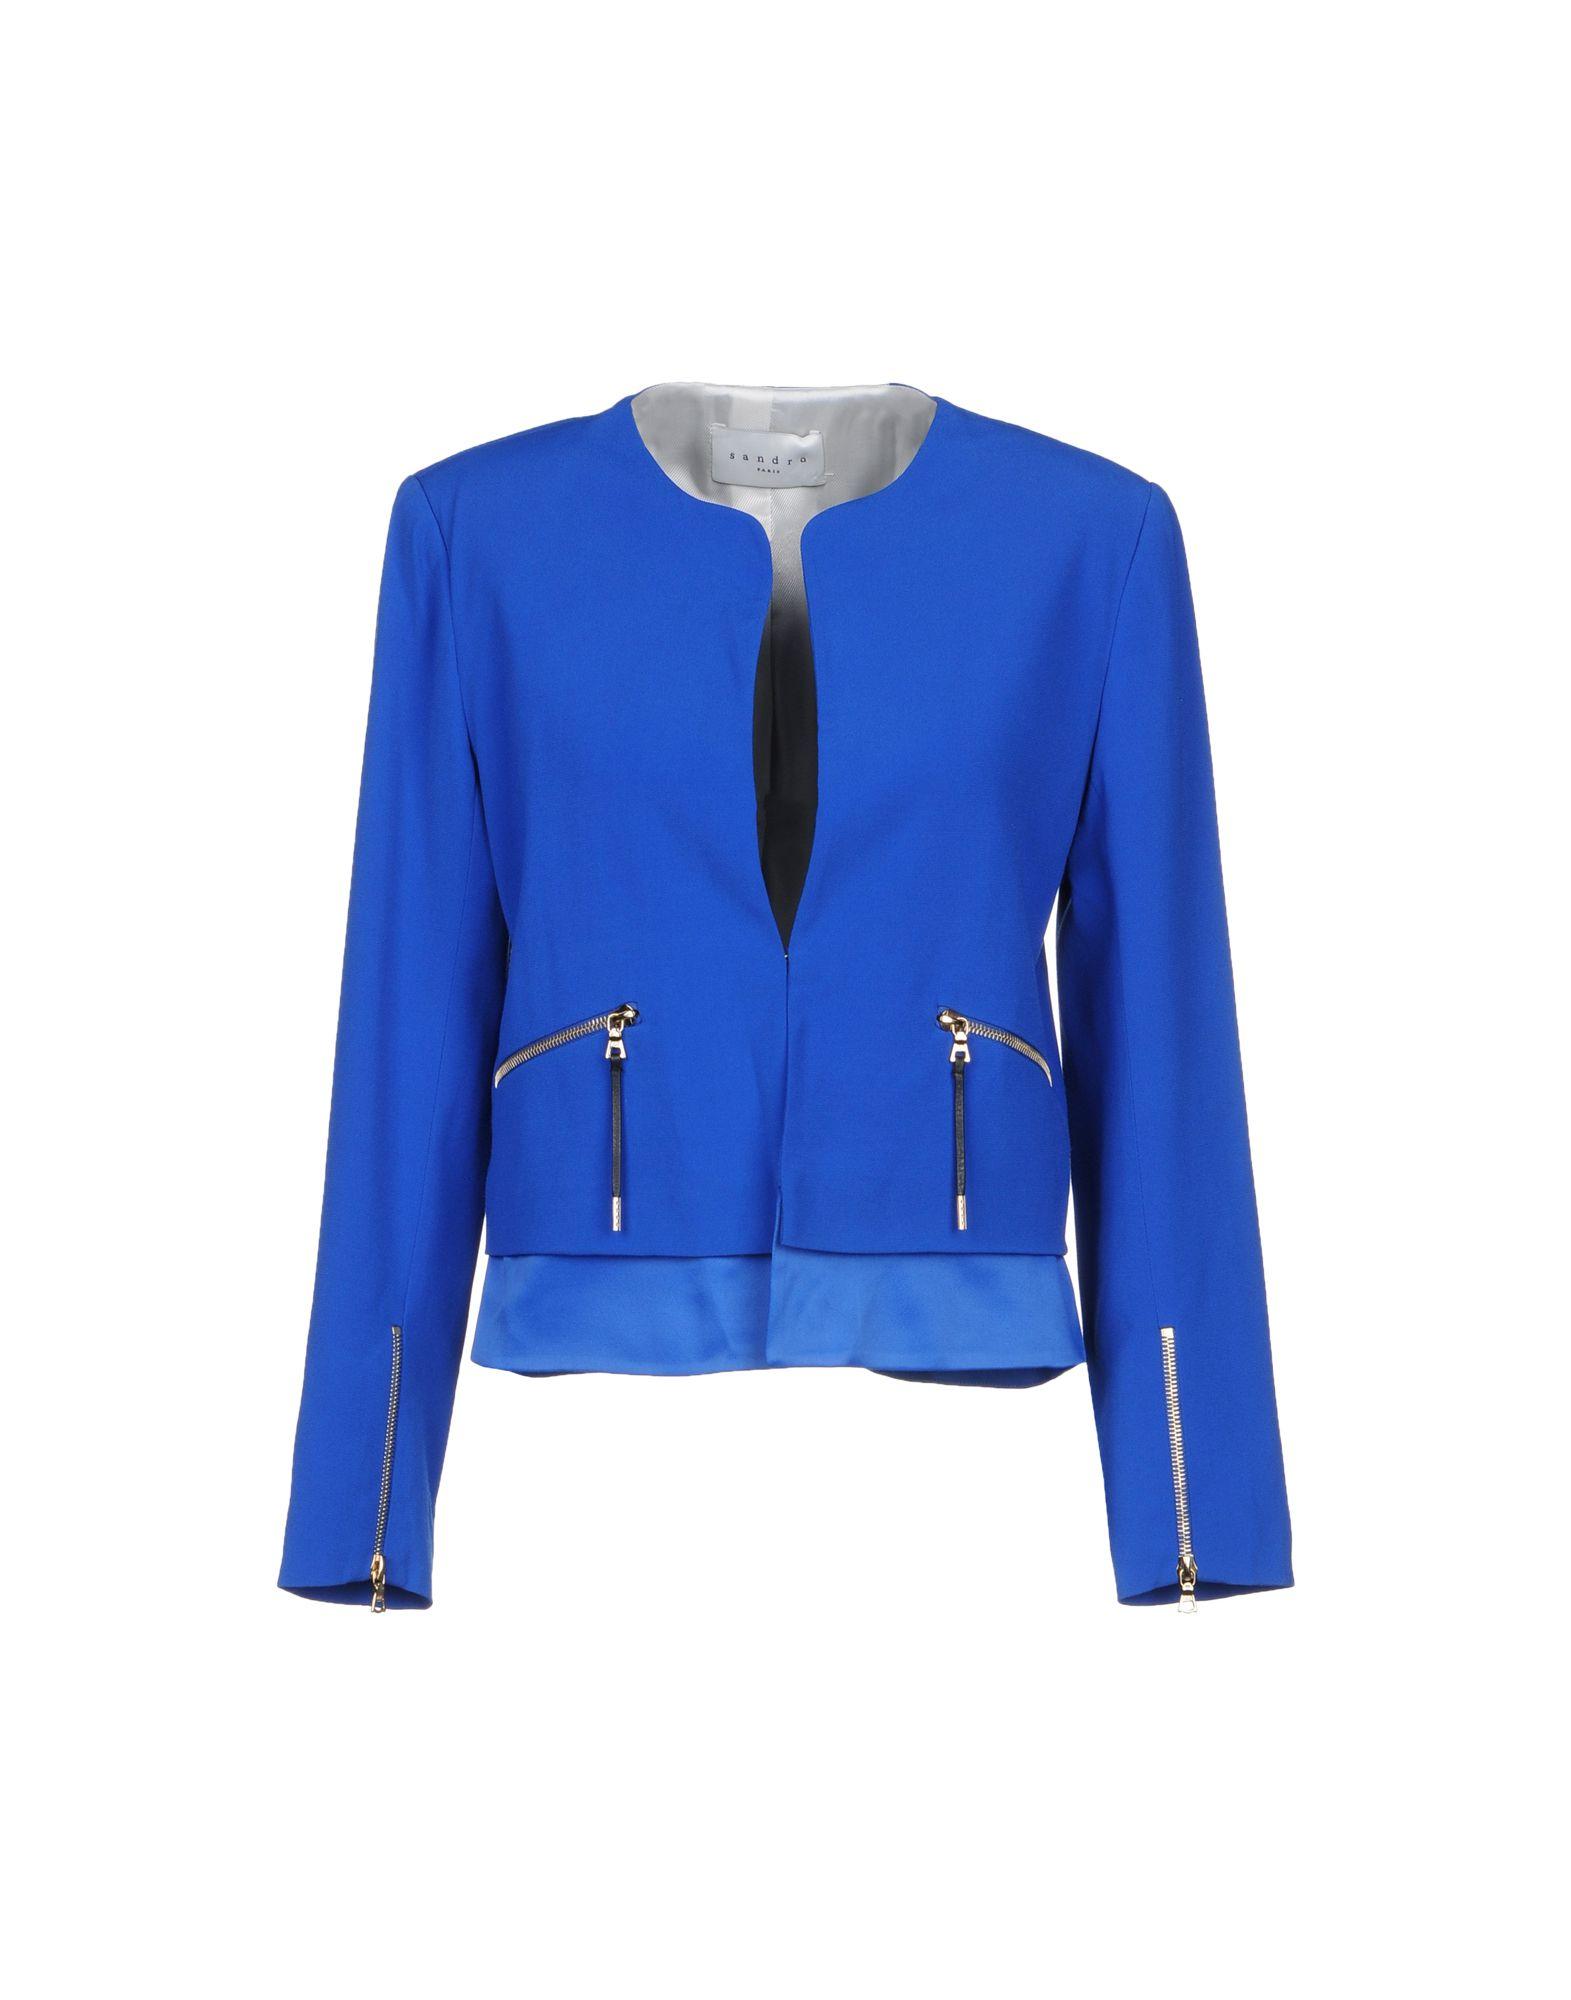 SANDRO PARIS Blazer in Bright Blue